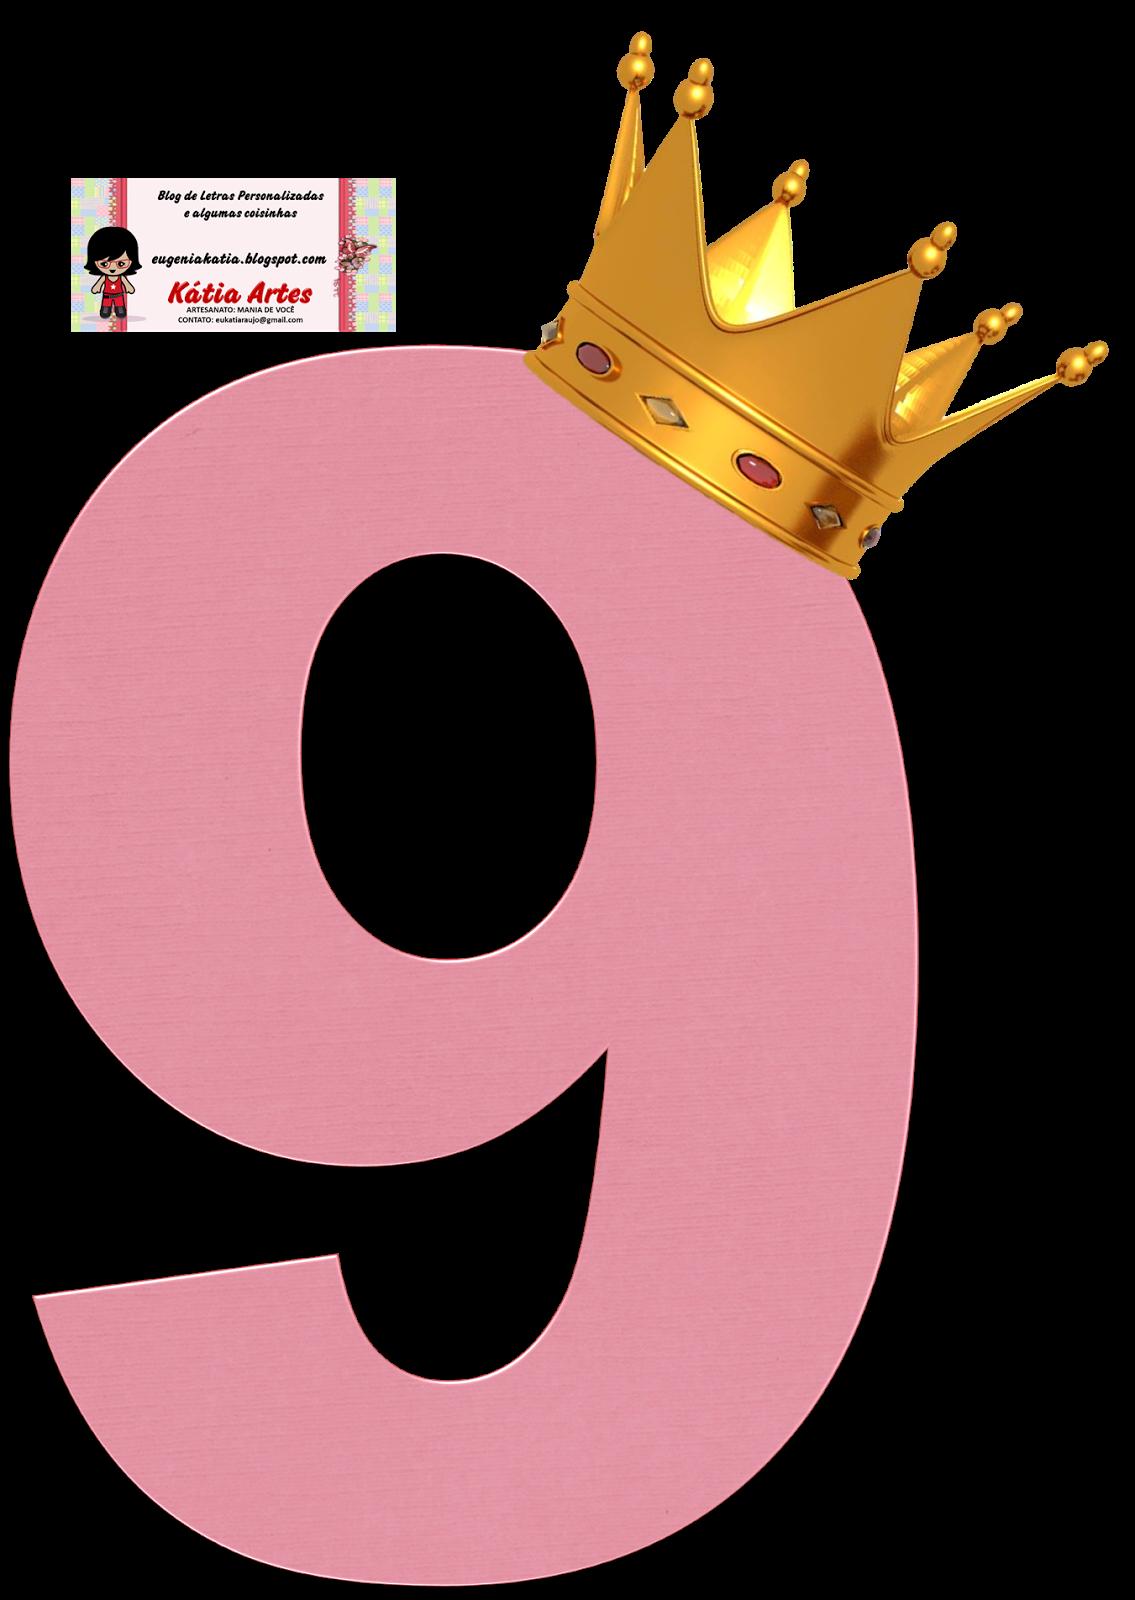 Numerais Rei e Rainhas | Caddellj | Pinterest | Alphabet letters ...